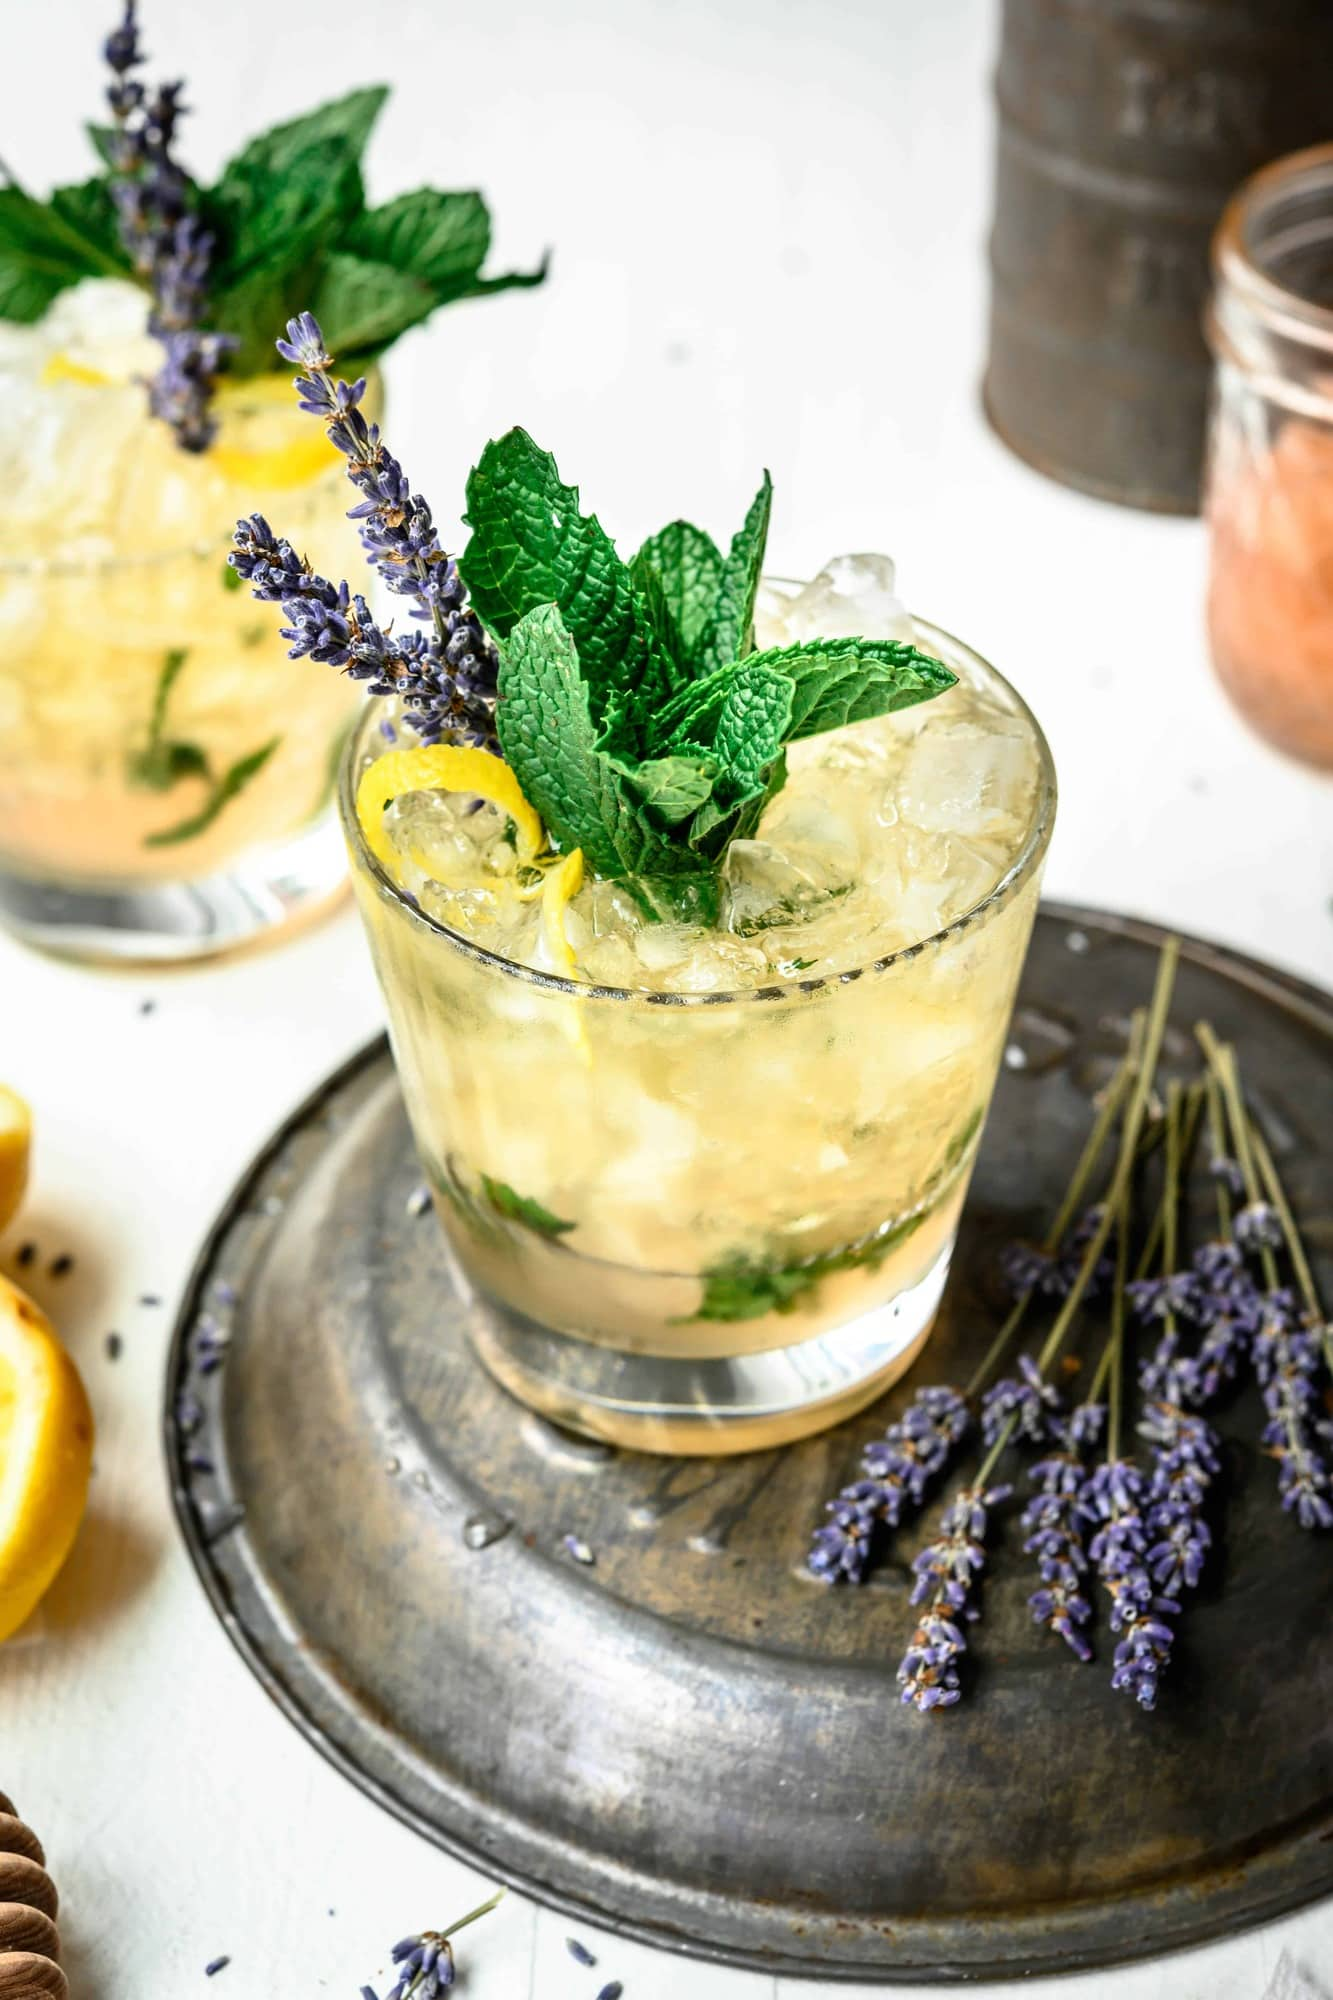 High side view of lemon lavender mint julep garnished with fresh mint, lavender and lemon peel